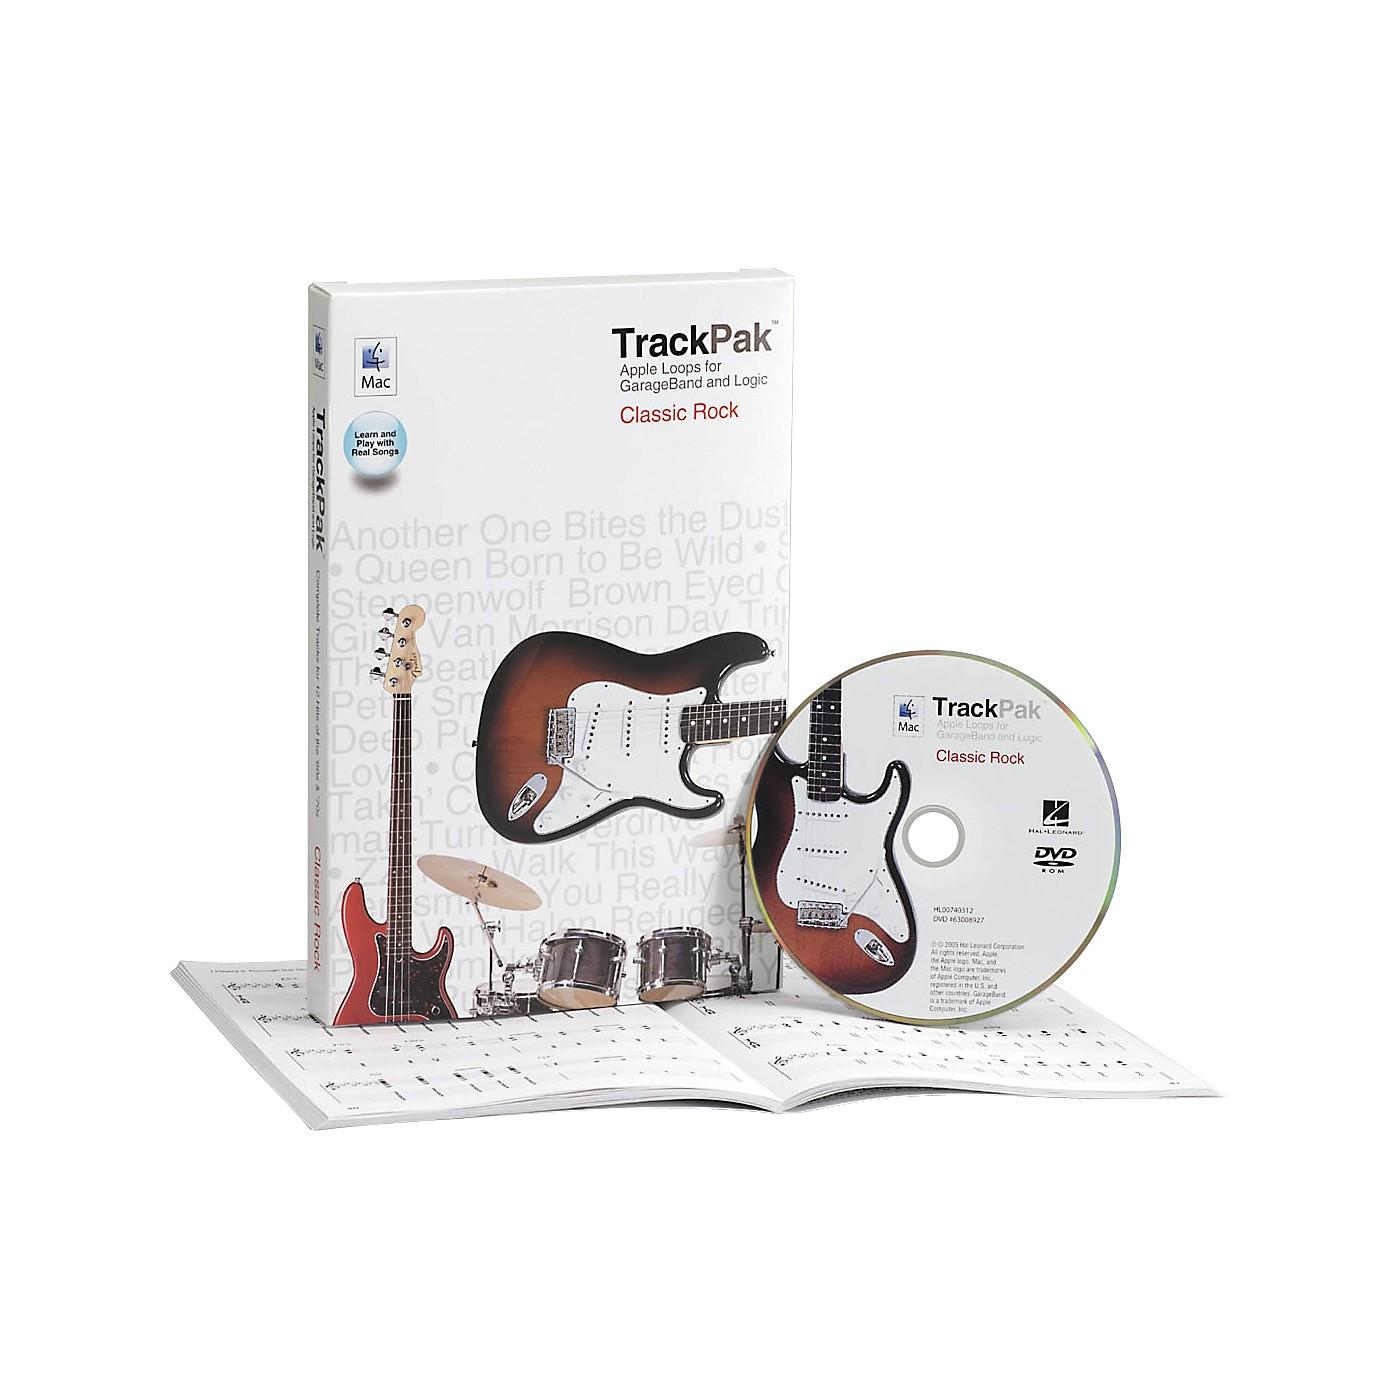 Hal Leonard GarageBand Classic Rock TrackPak (Book/DVD-ROM) thumbnail